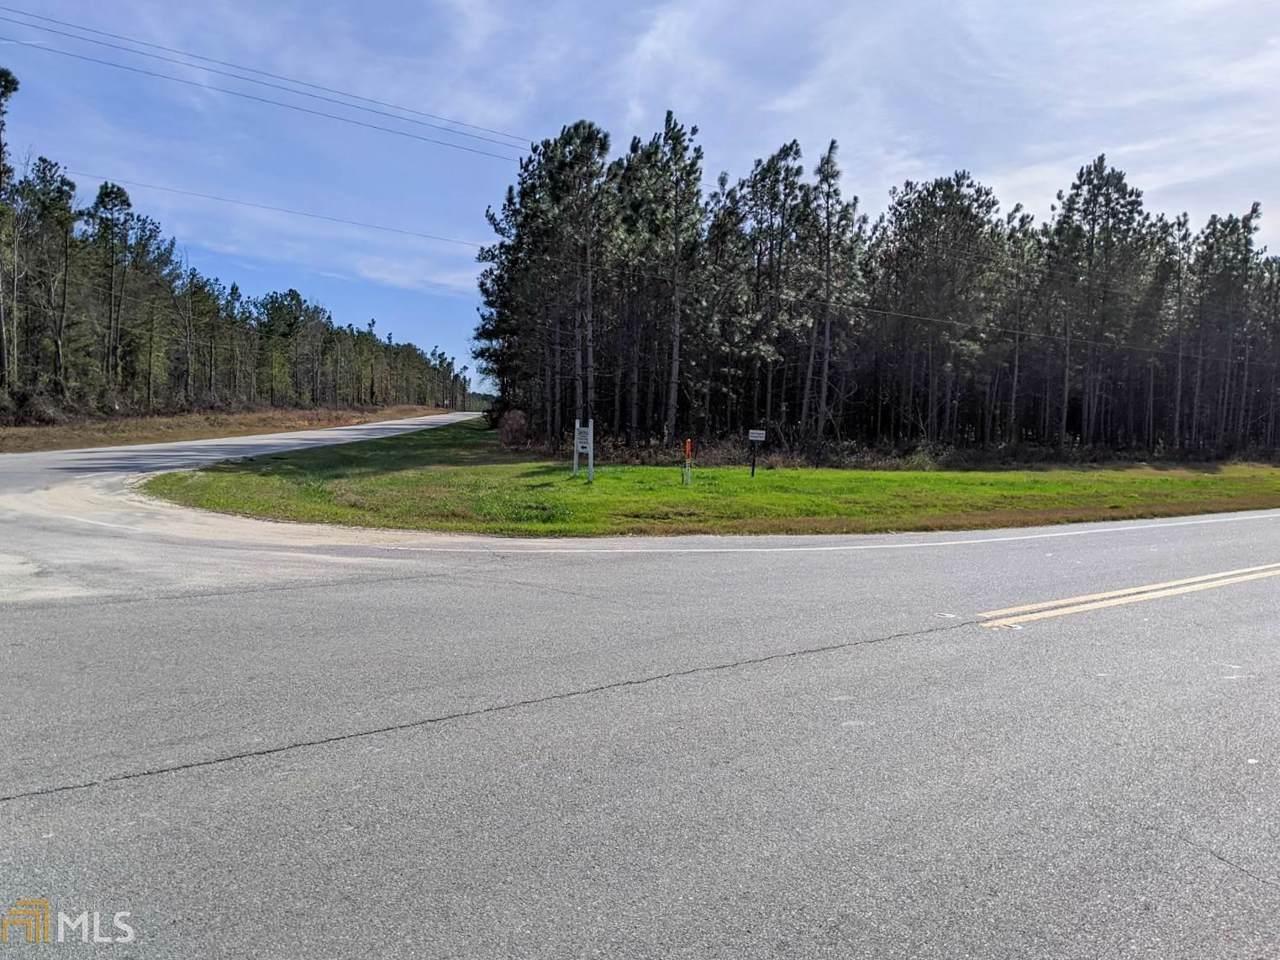 0 Highway 23 - Photo 1